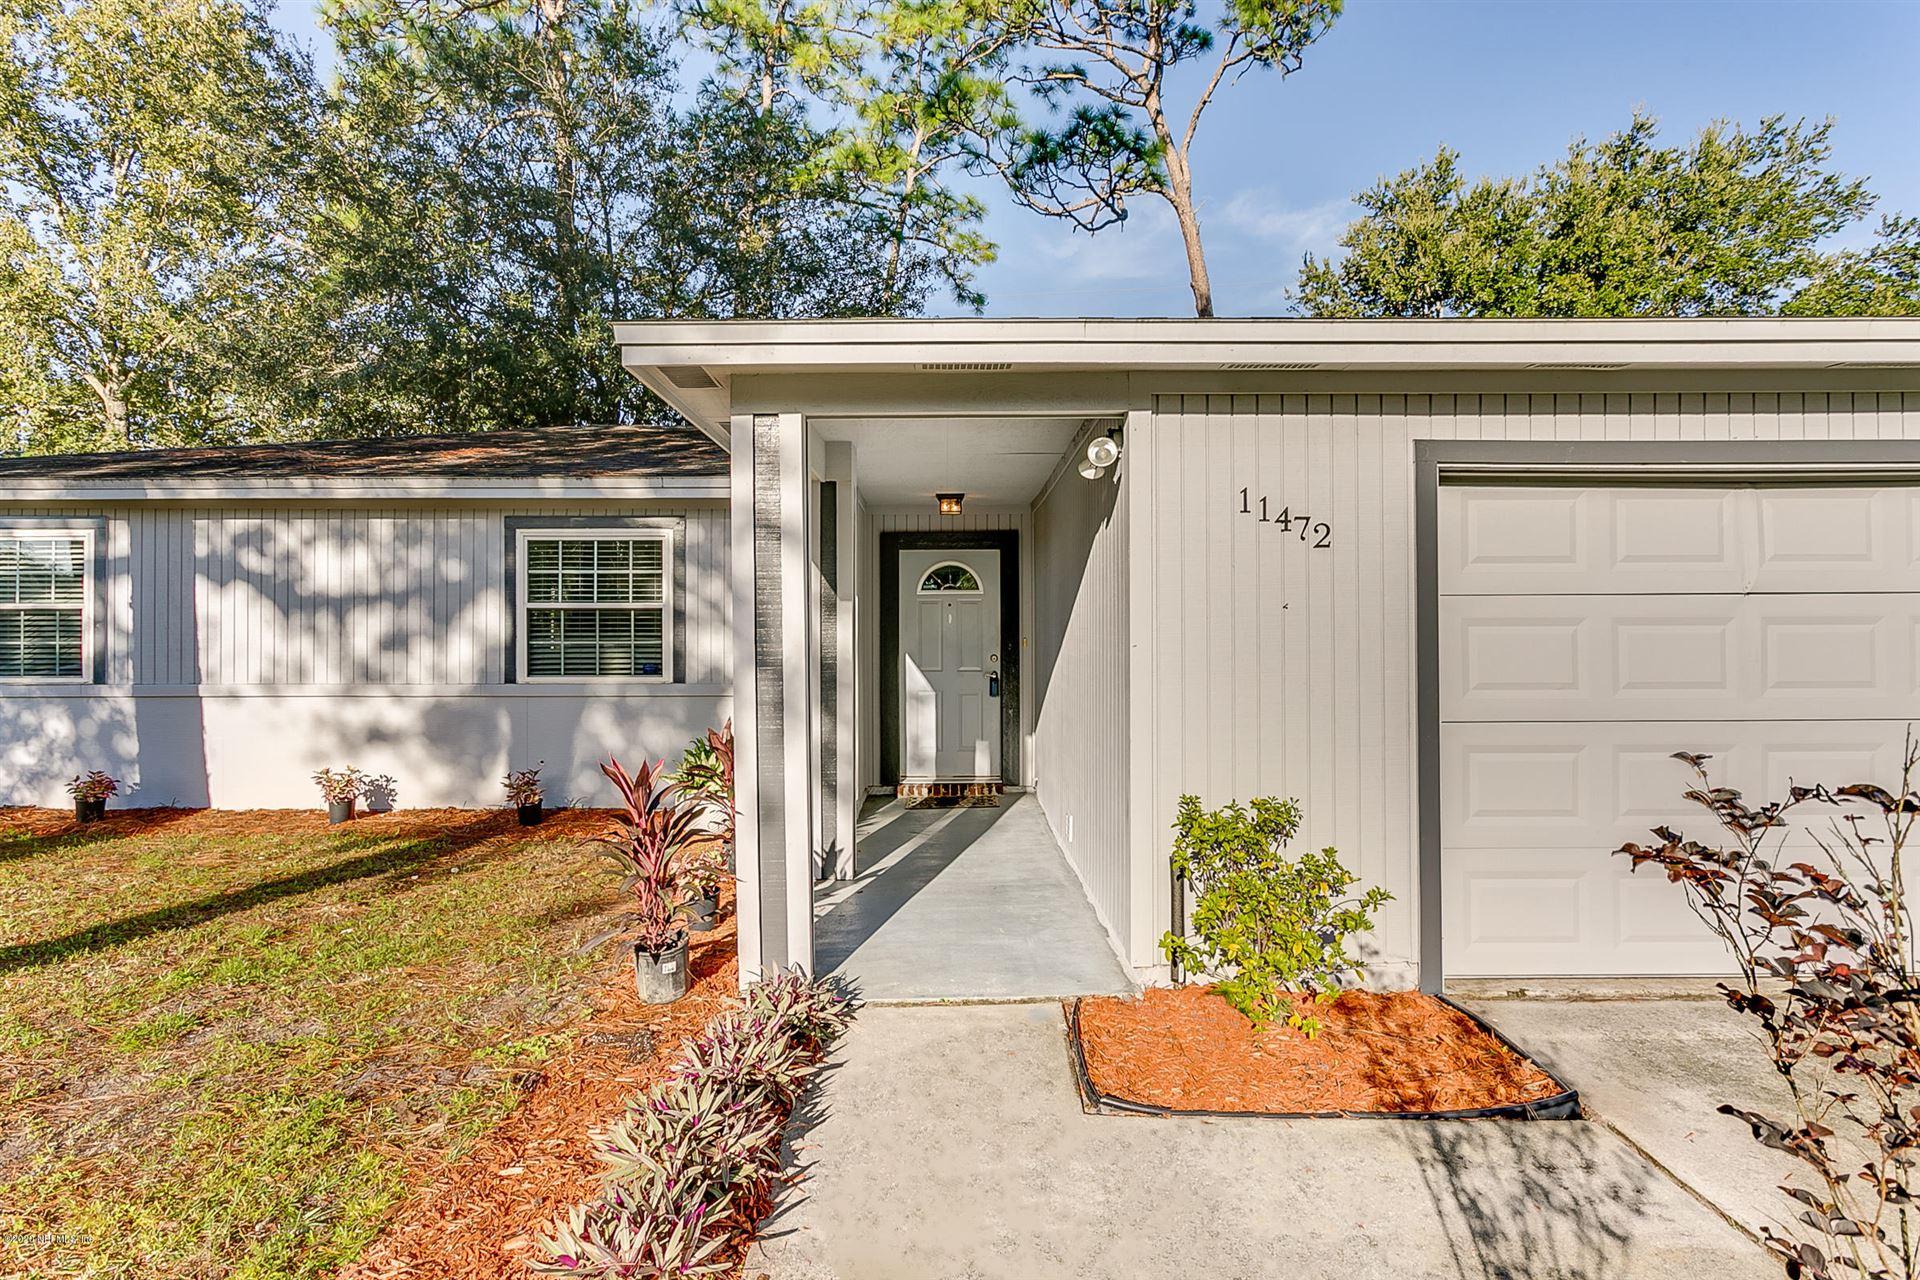 11472 CYPRESS BEND CT, Jacksonville, FL 32223 - MLS#: 1071722